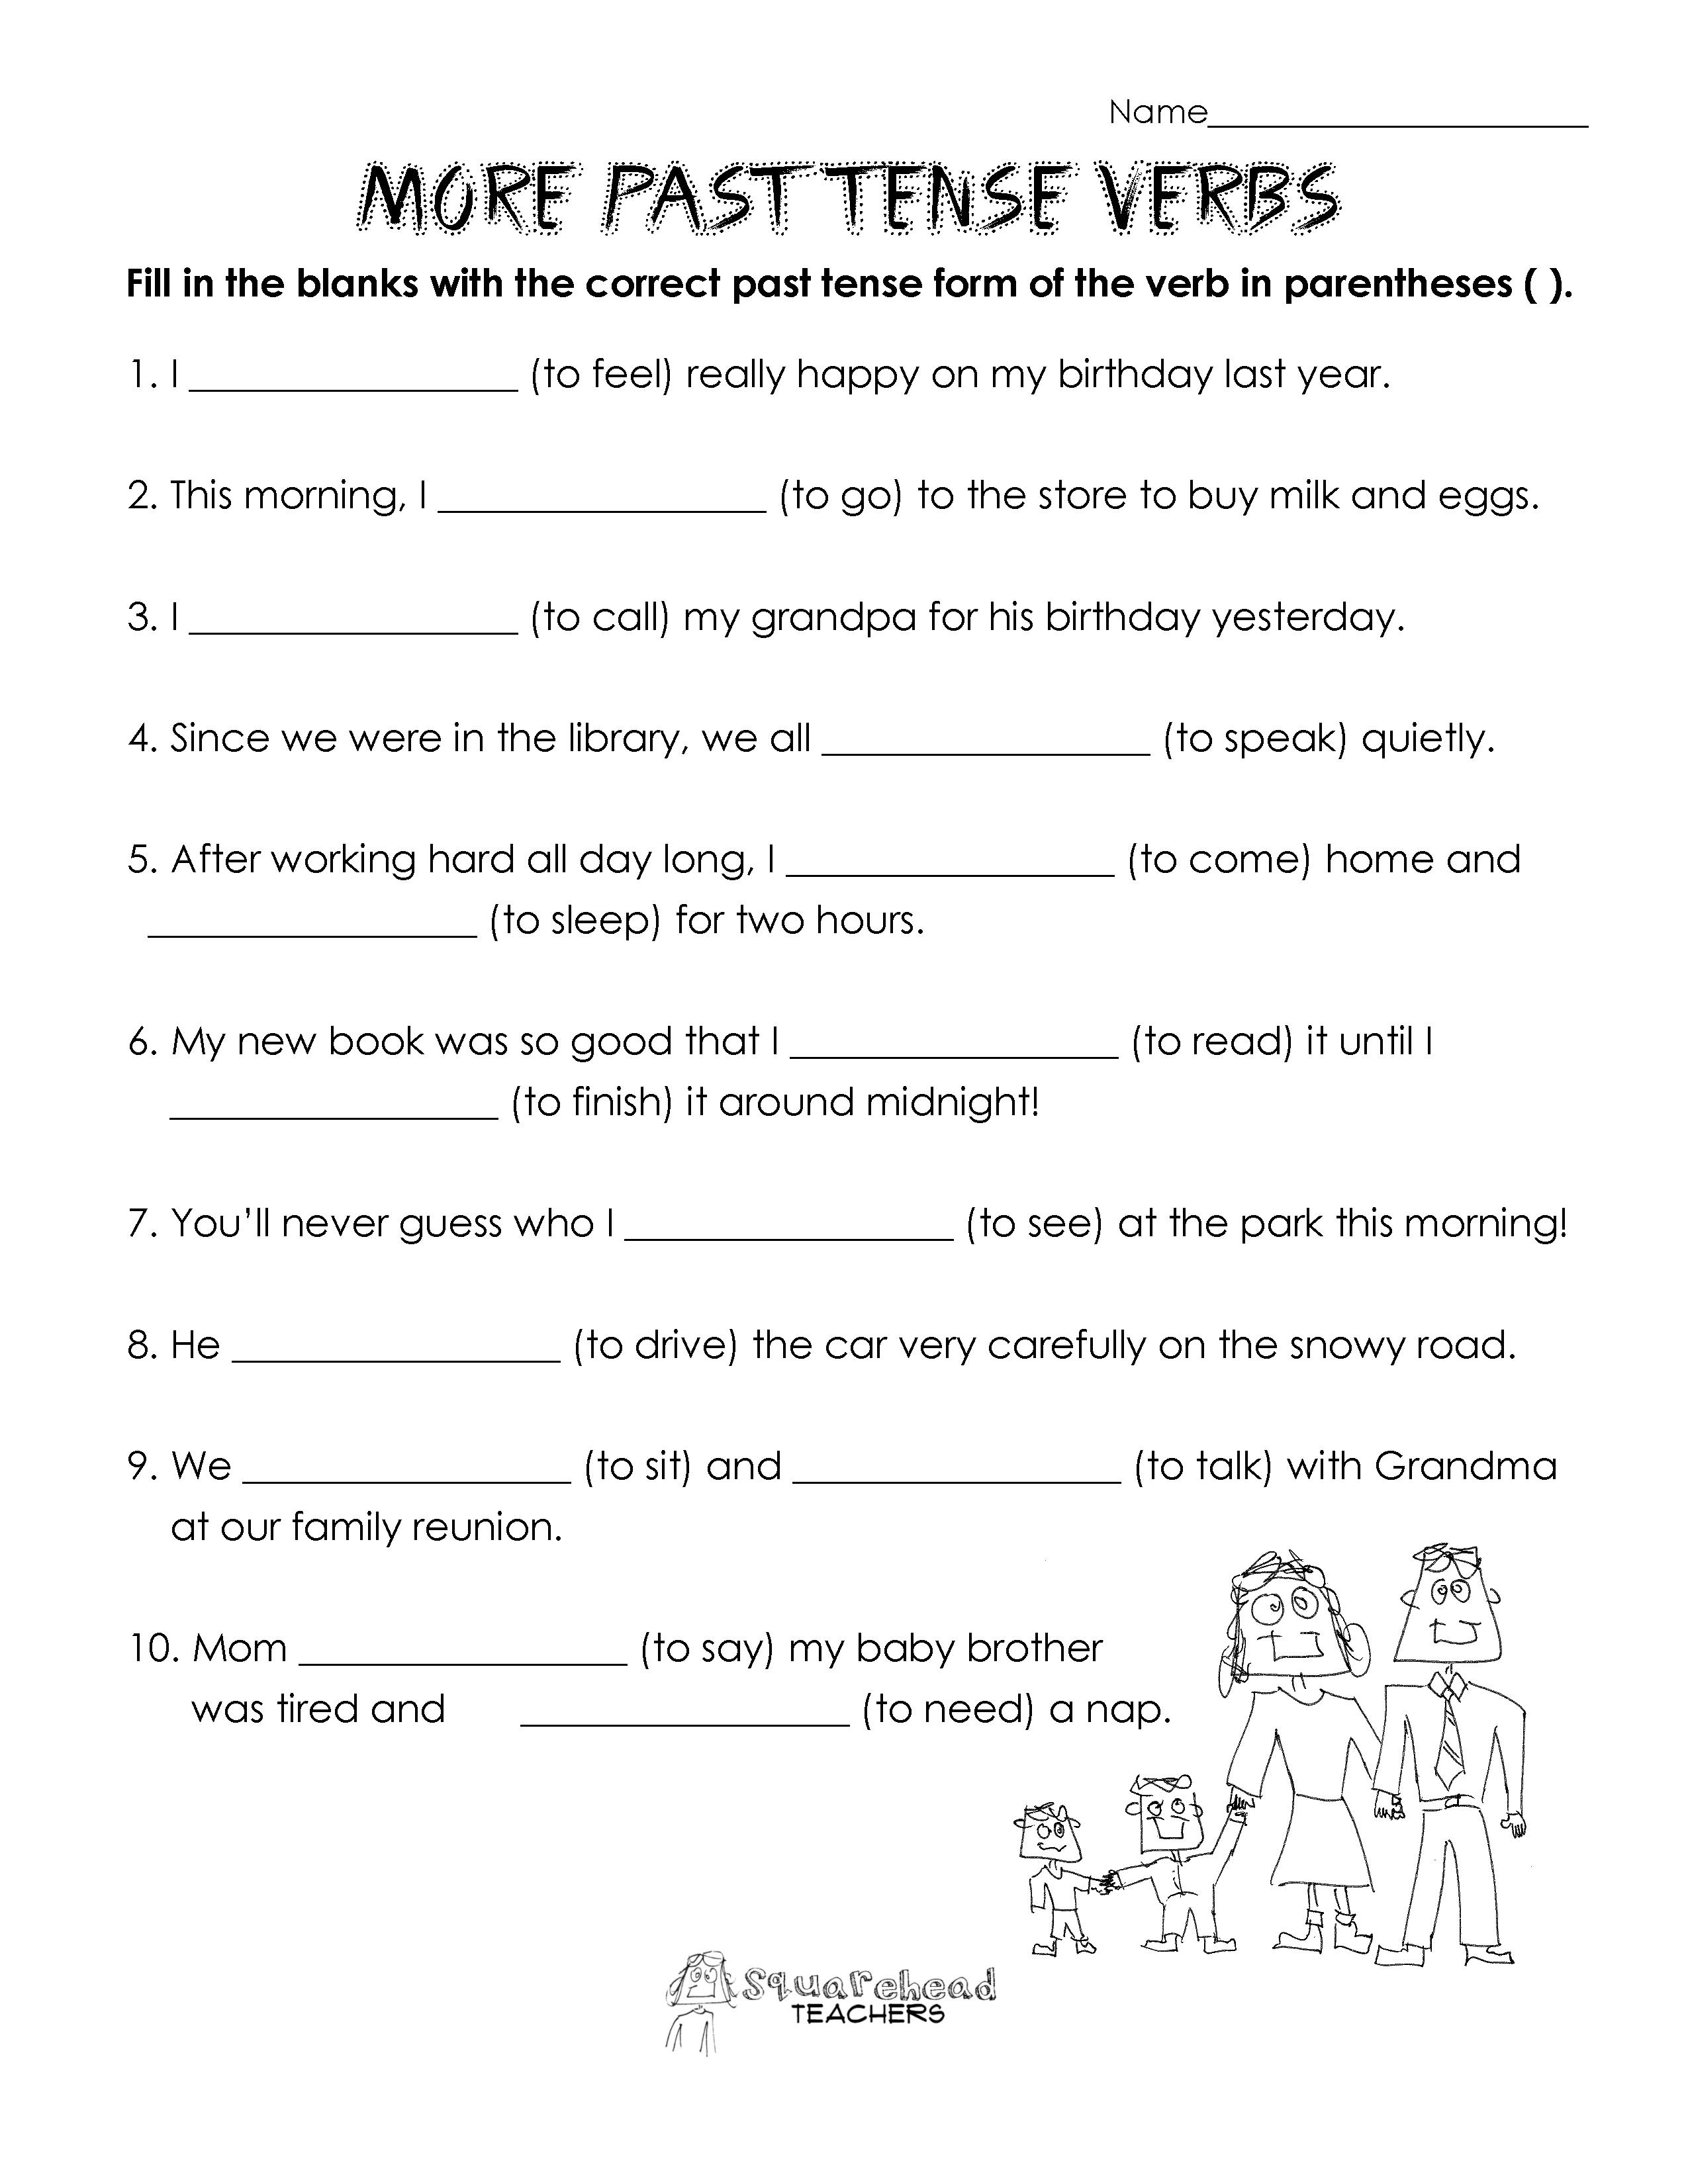 Past Tense Verbs Practice